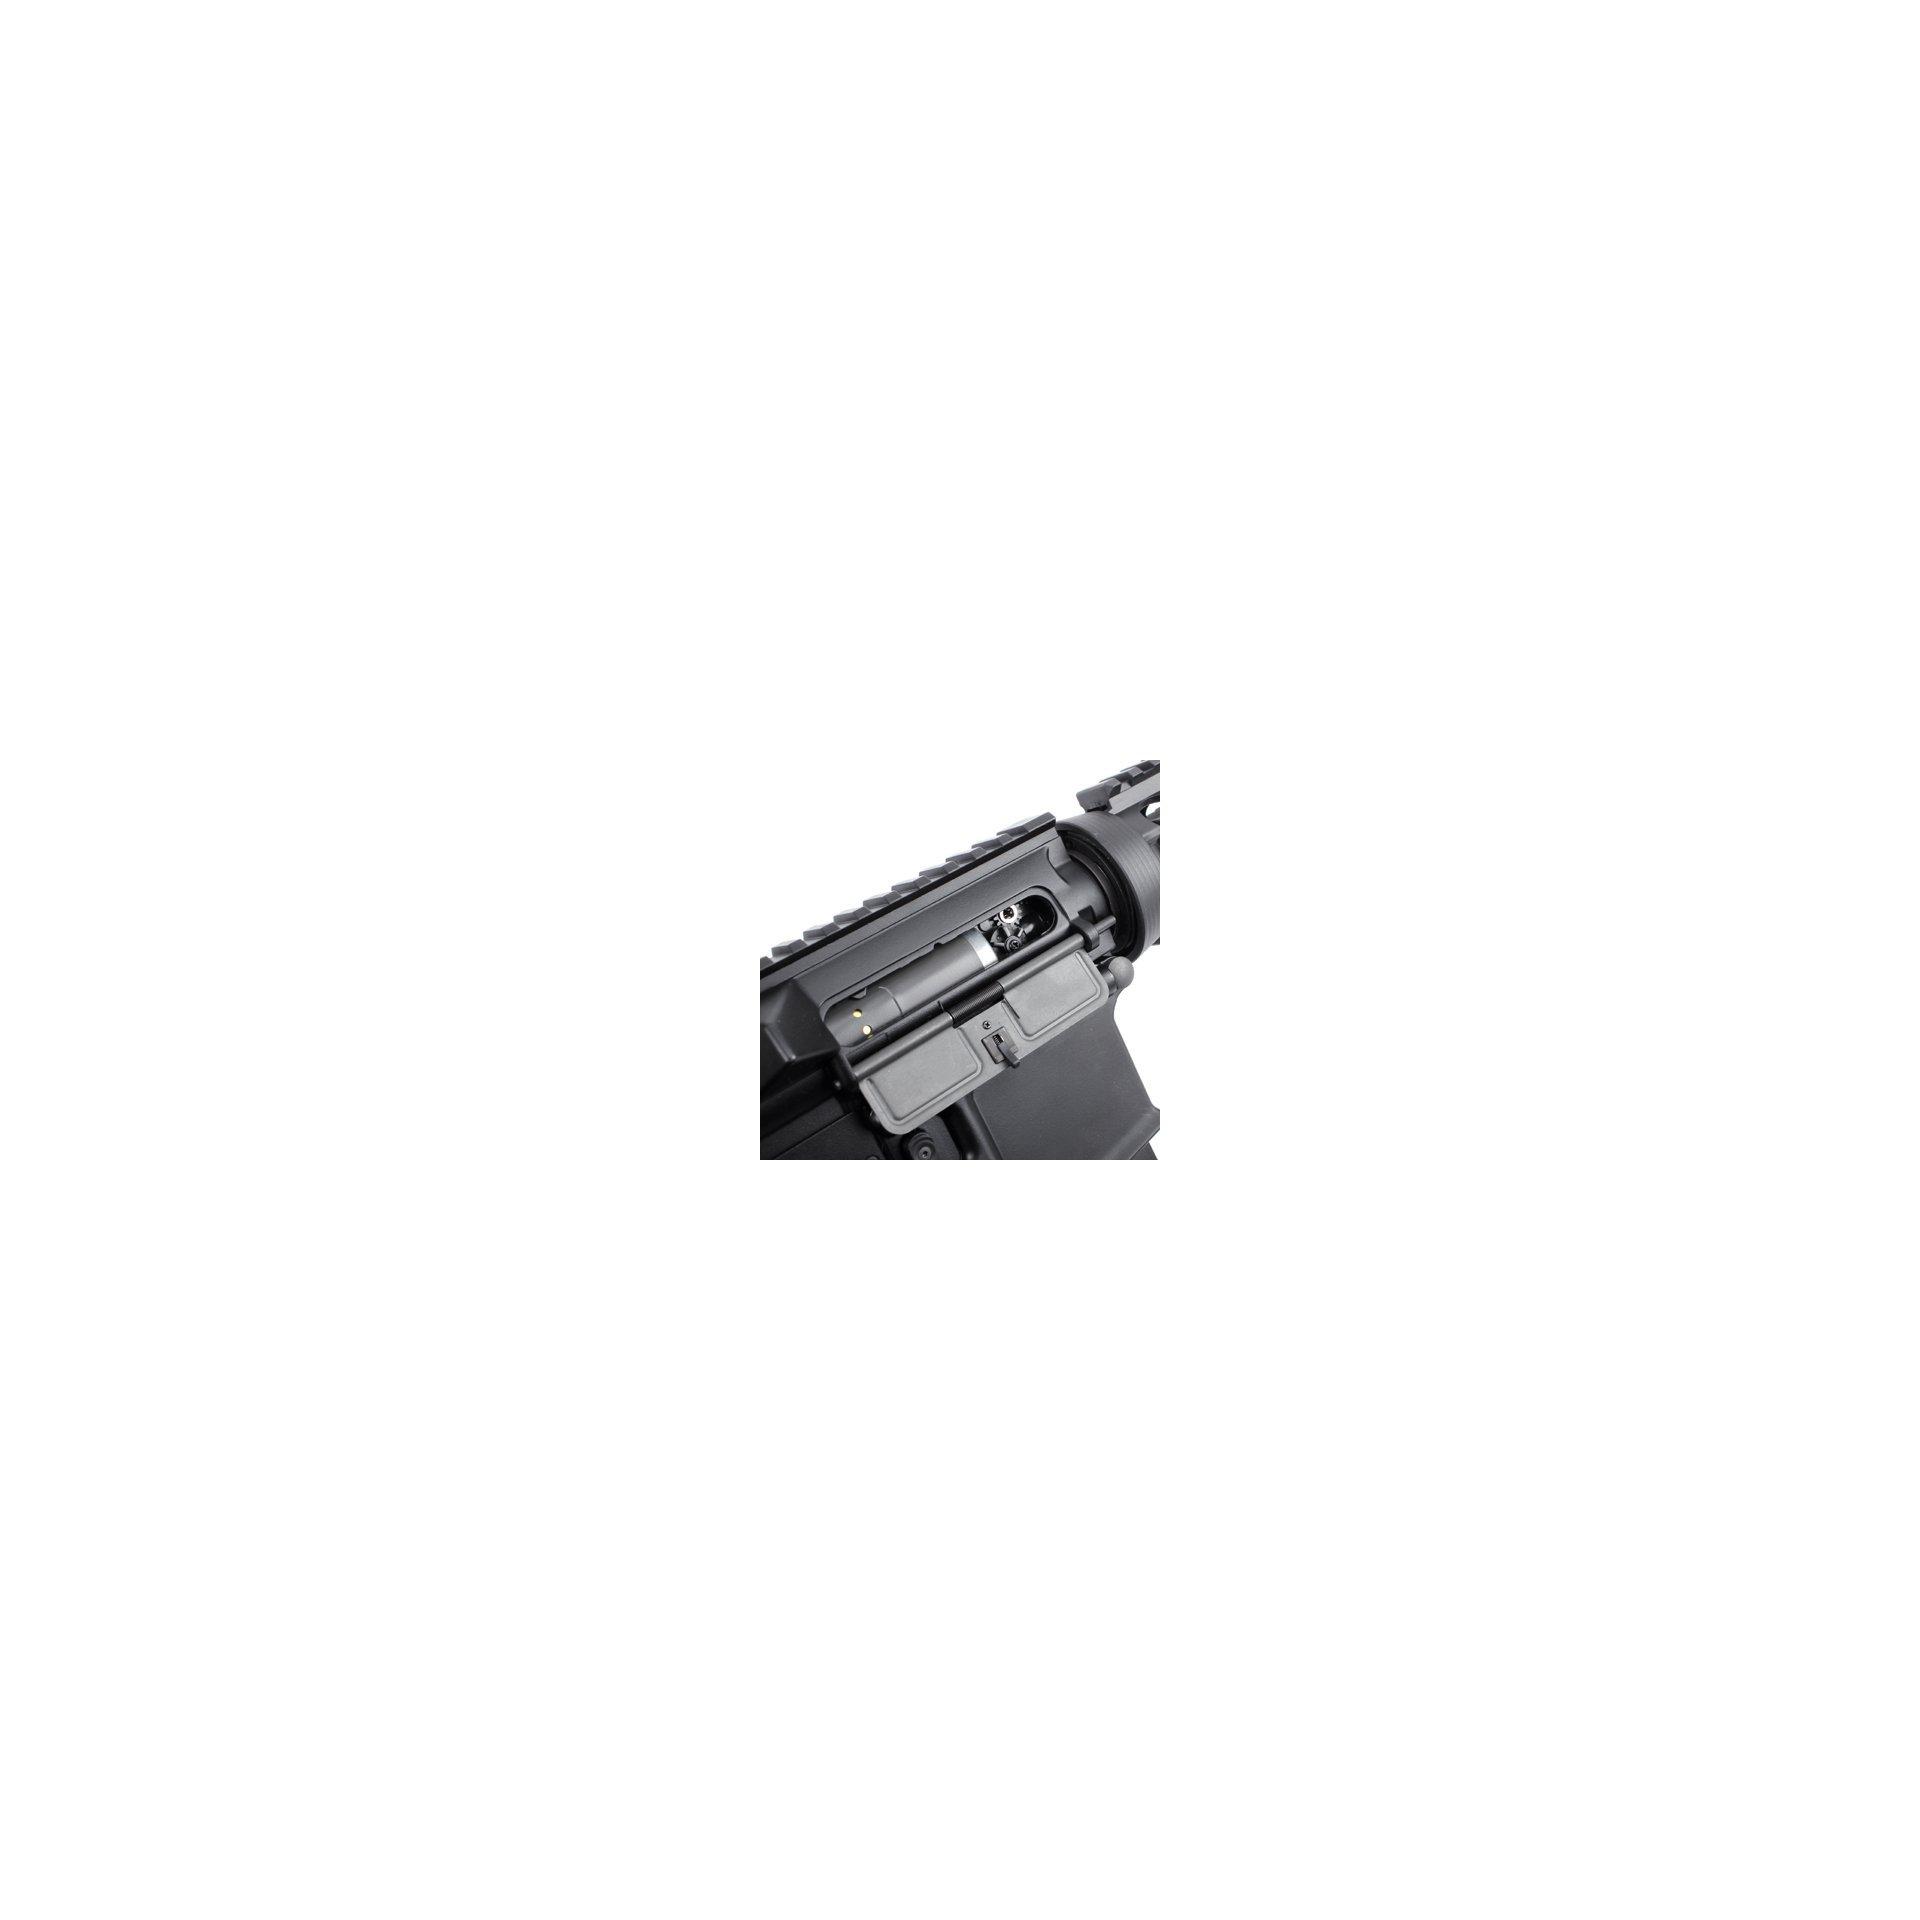 Rifle De Airsoft M4 Ris Ultra Grade Cal 6.0mm - King Arms + Pistola Glock Cyma